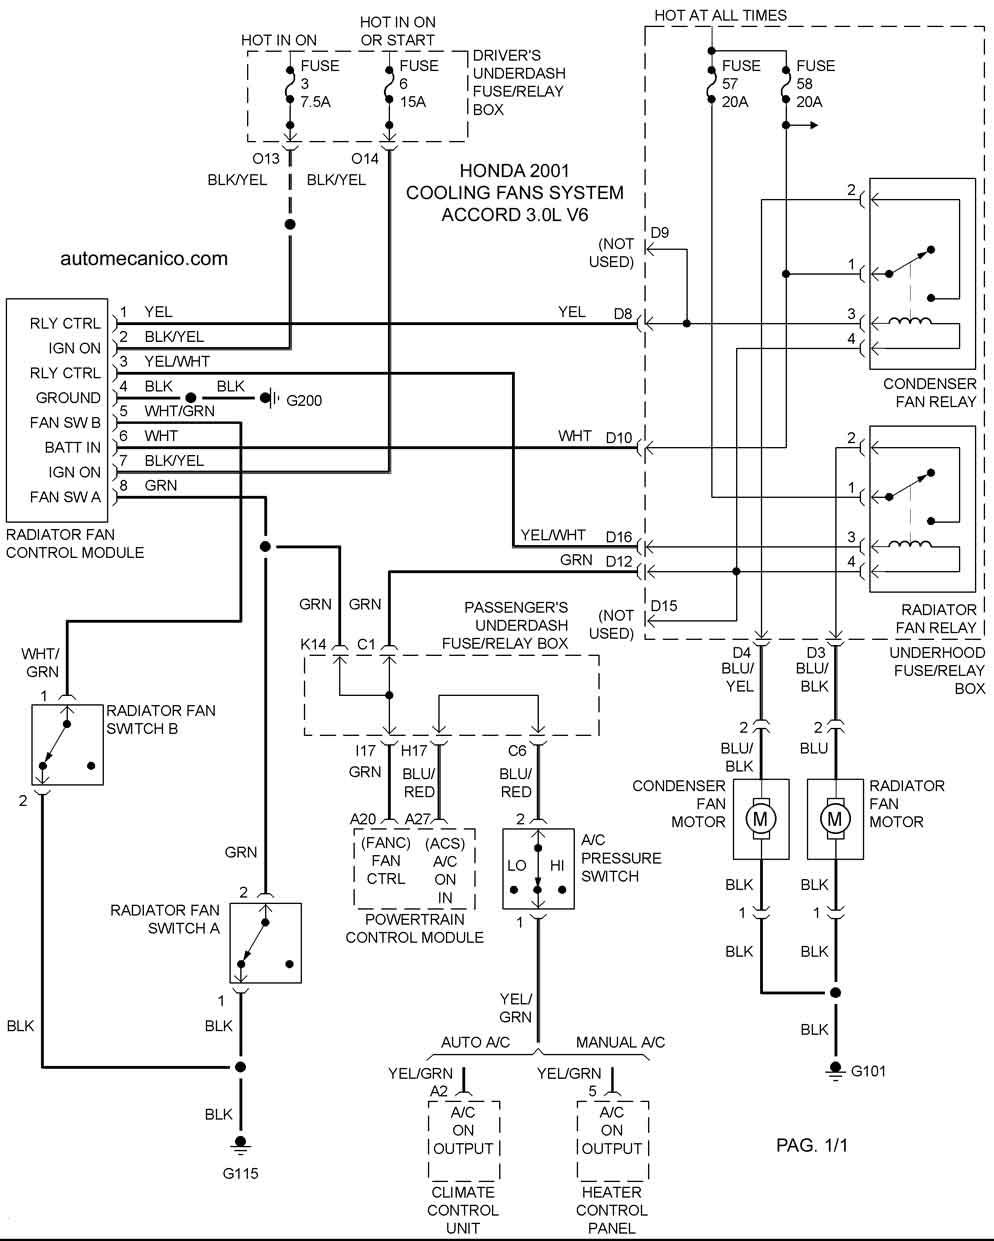 2001 honda civic wiring diagram car tuning